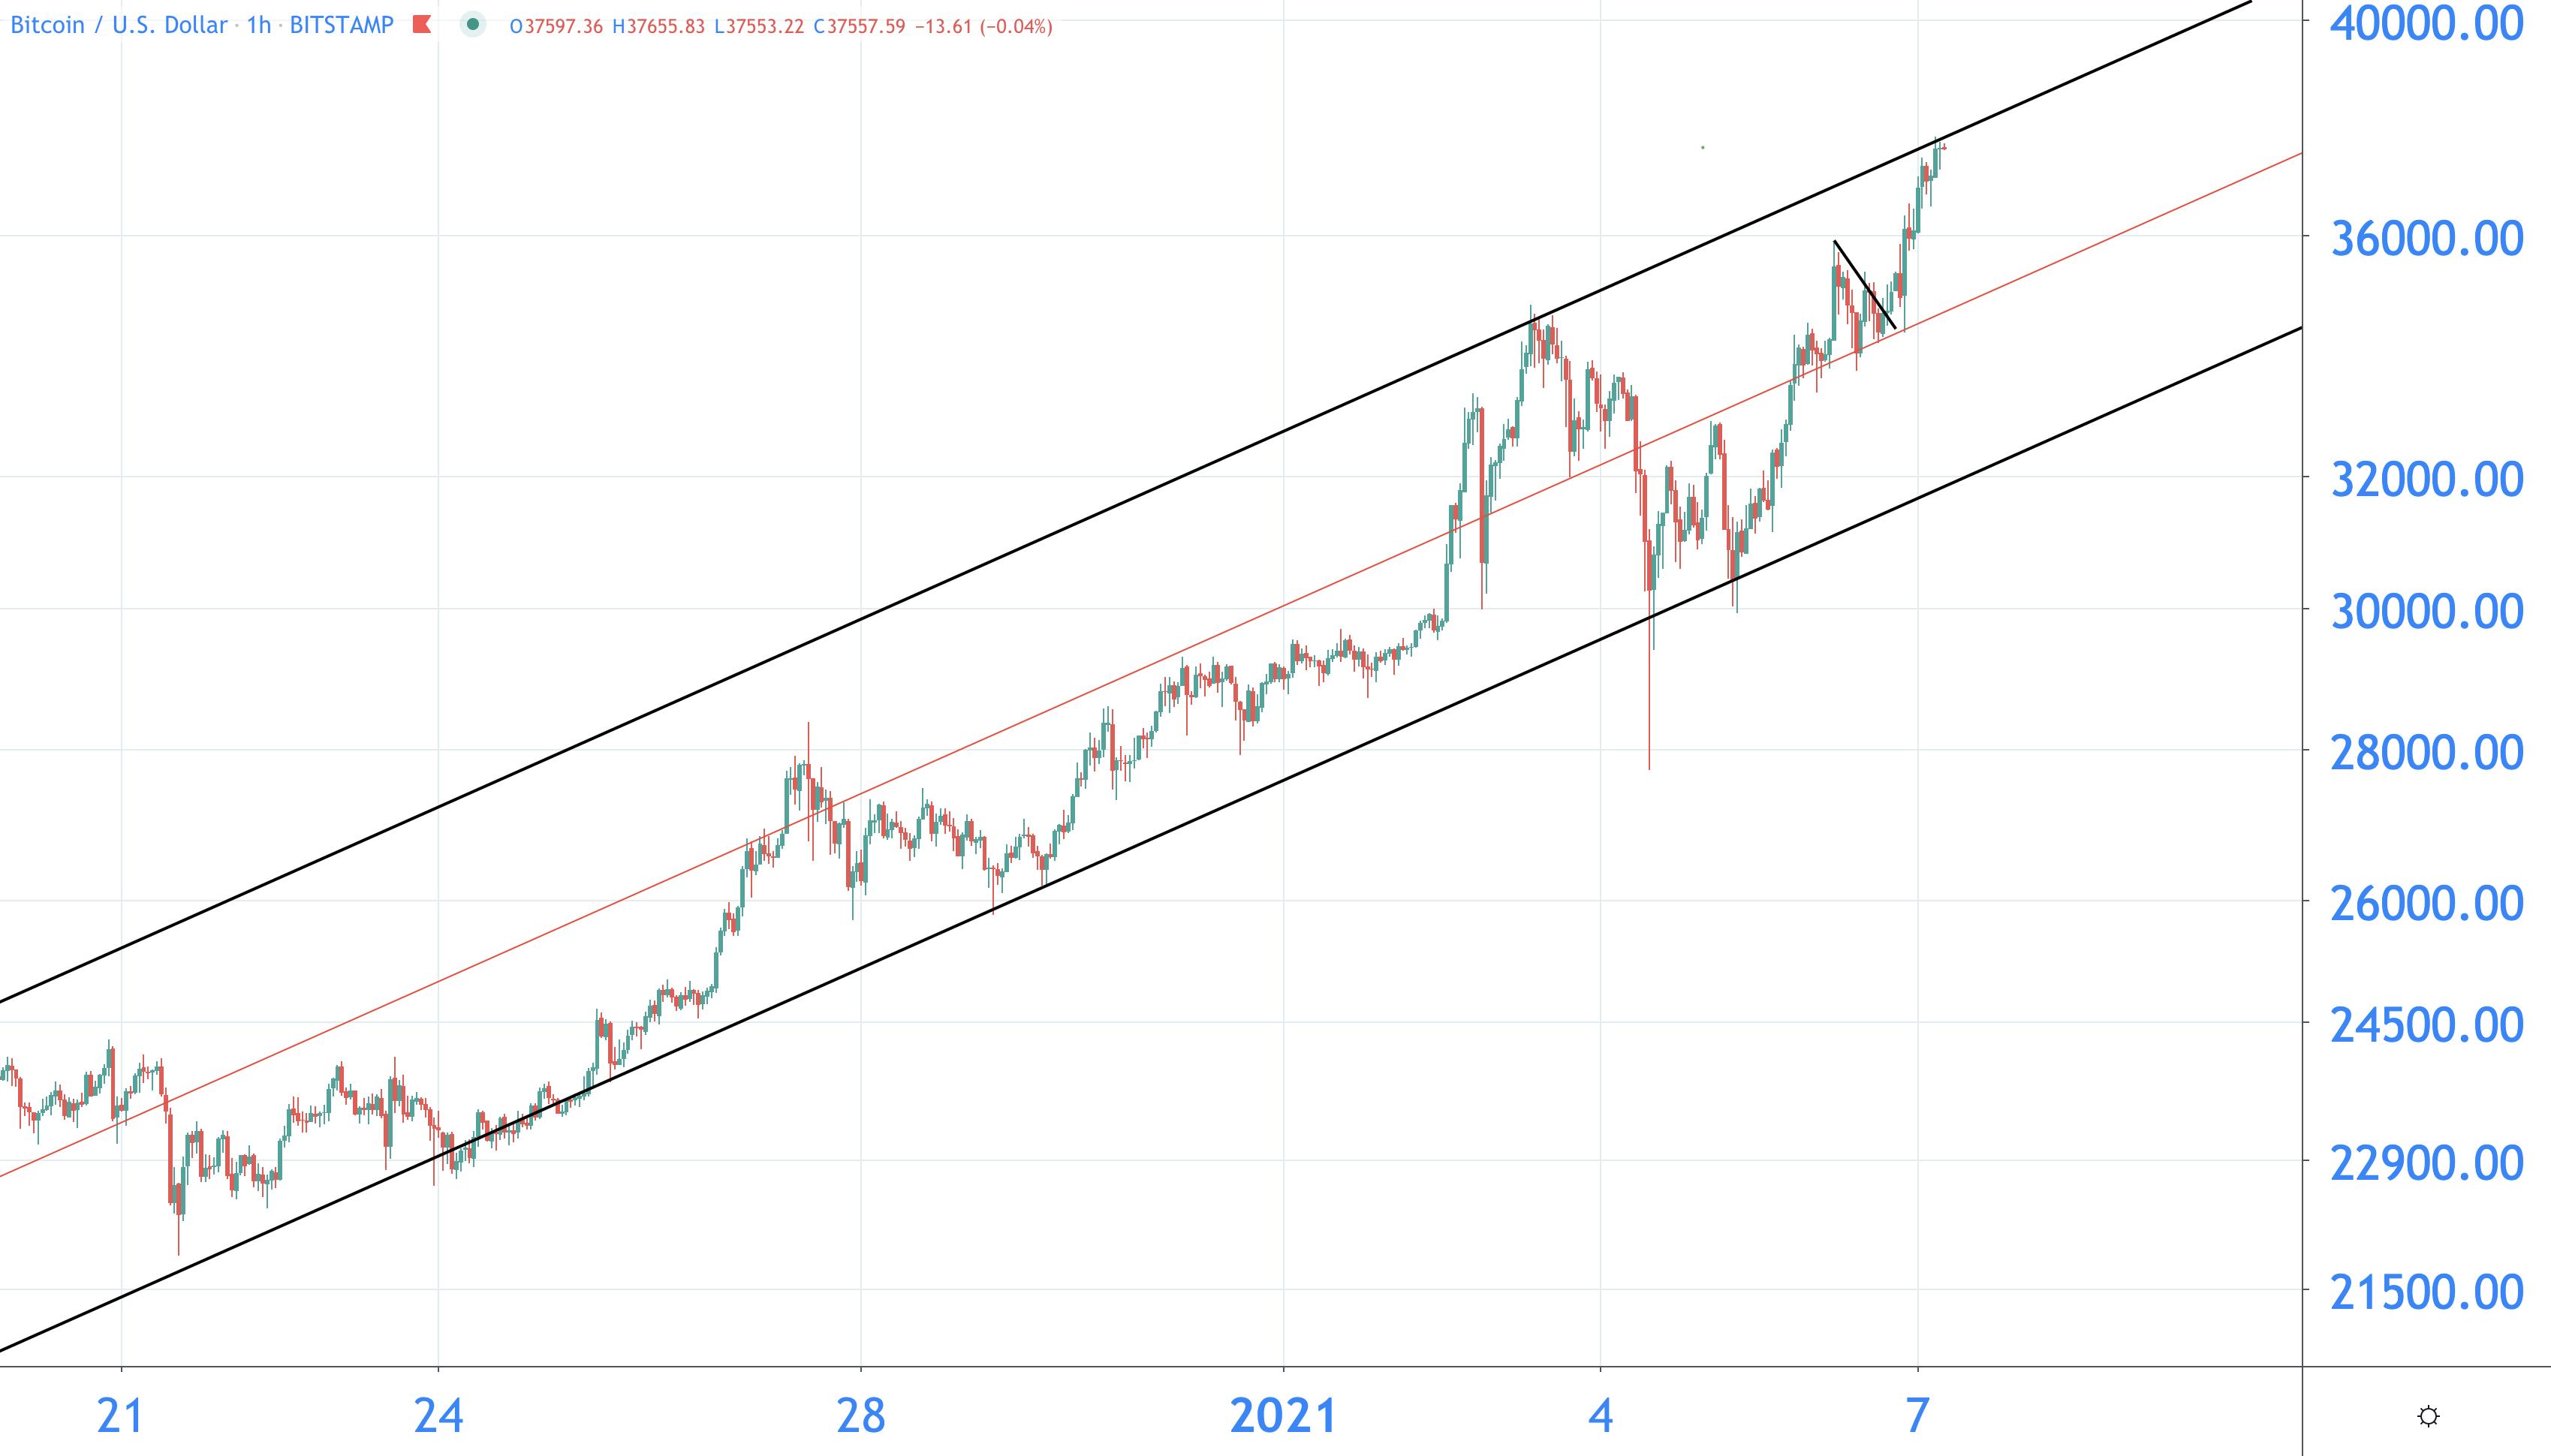 bitcoin koersdoel 2021)